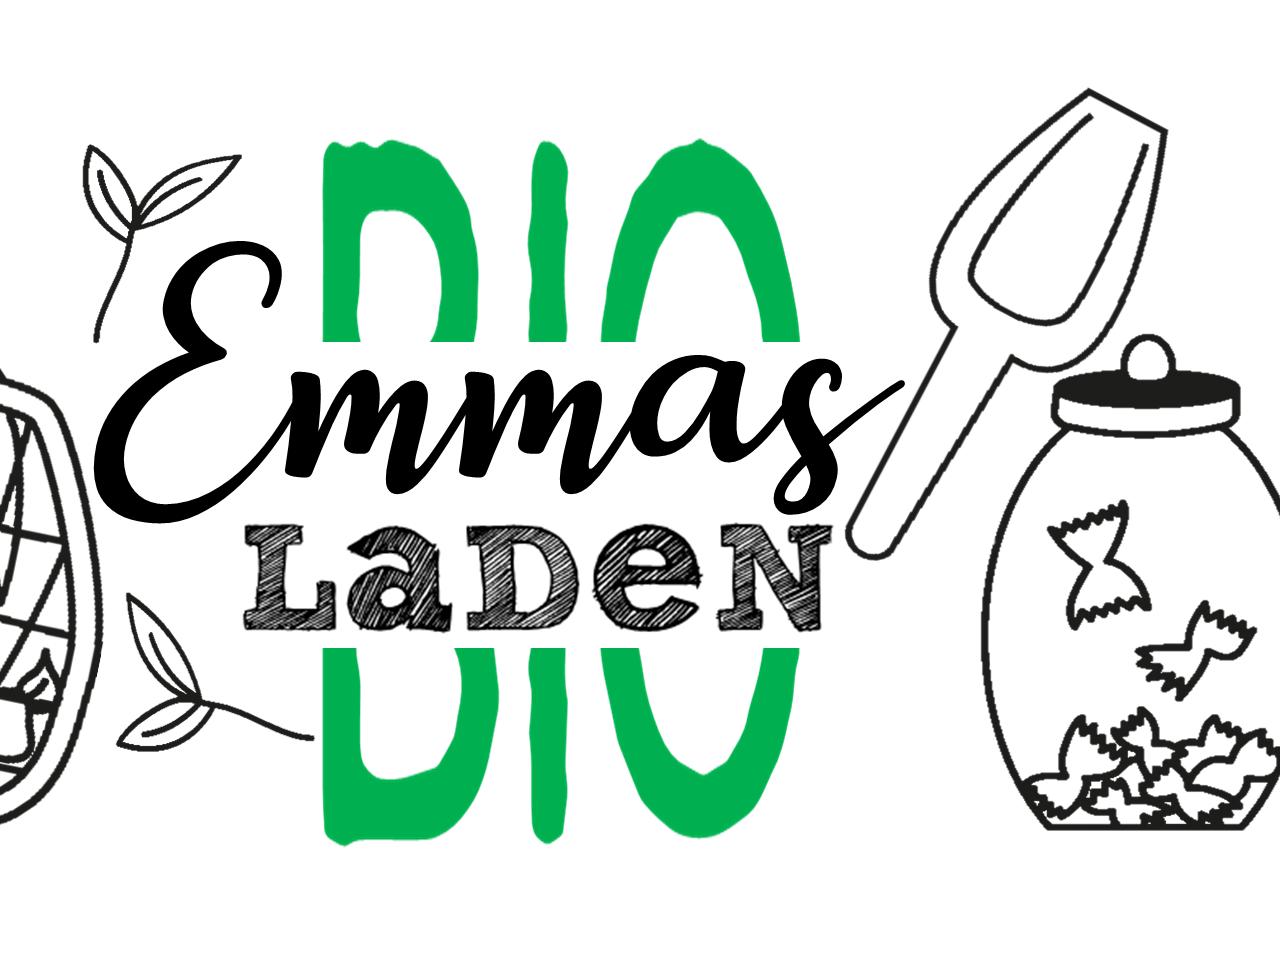 Emmas-Bio-Laden